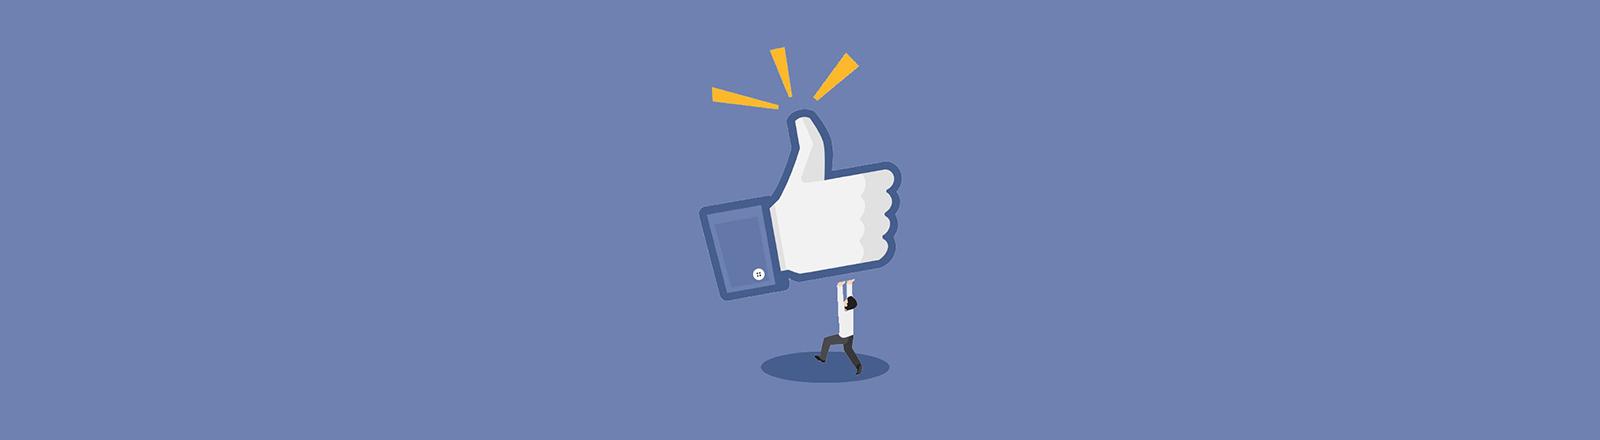 facebook-giant-thumb-eye